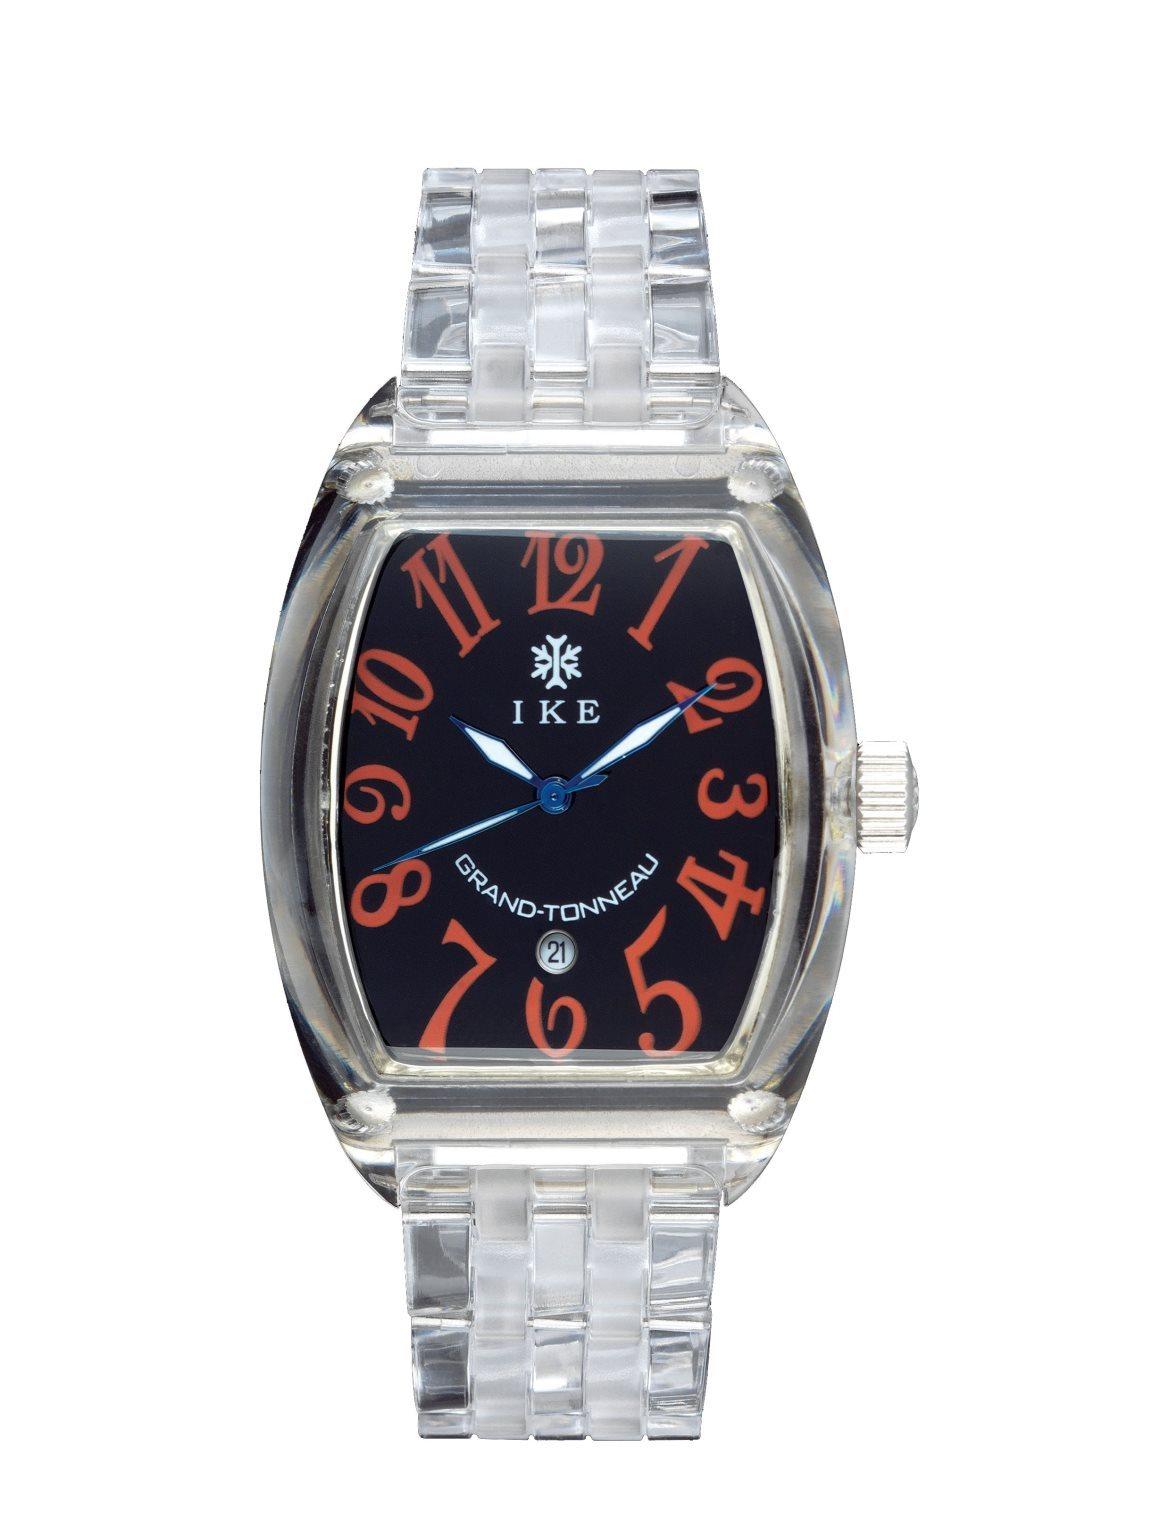 Reloj Unisex Ike Analogico Gto911